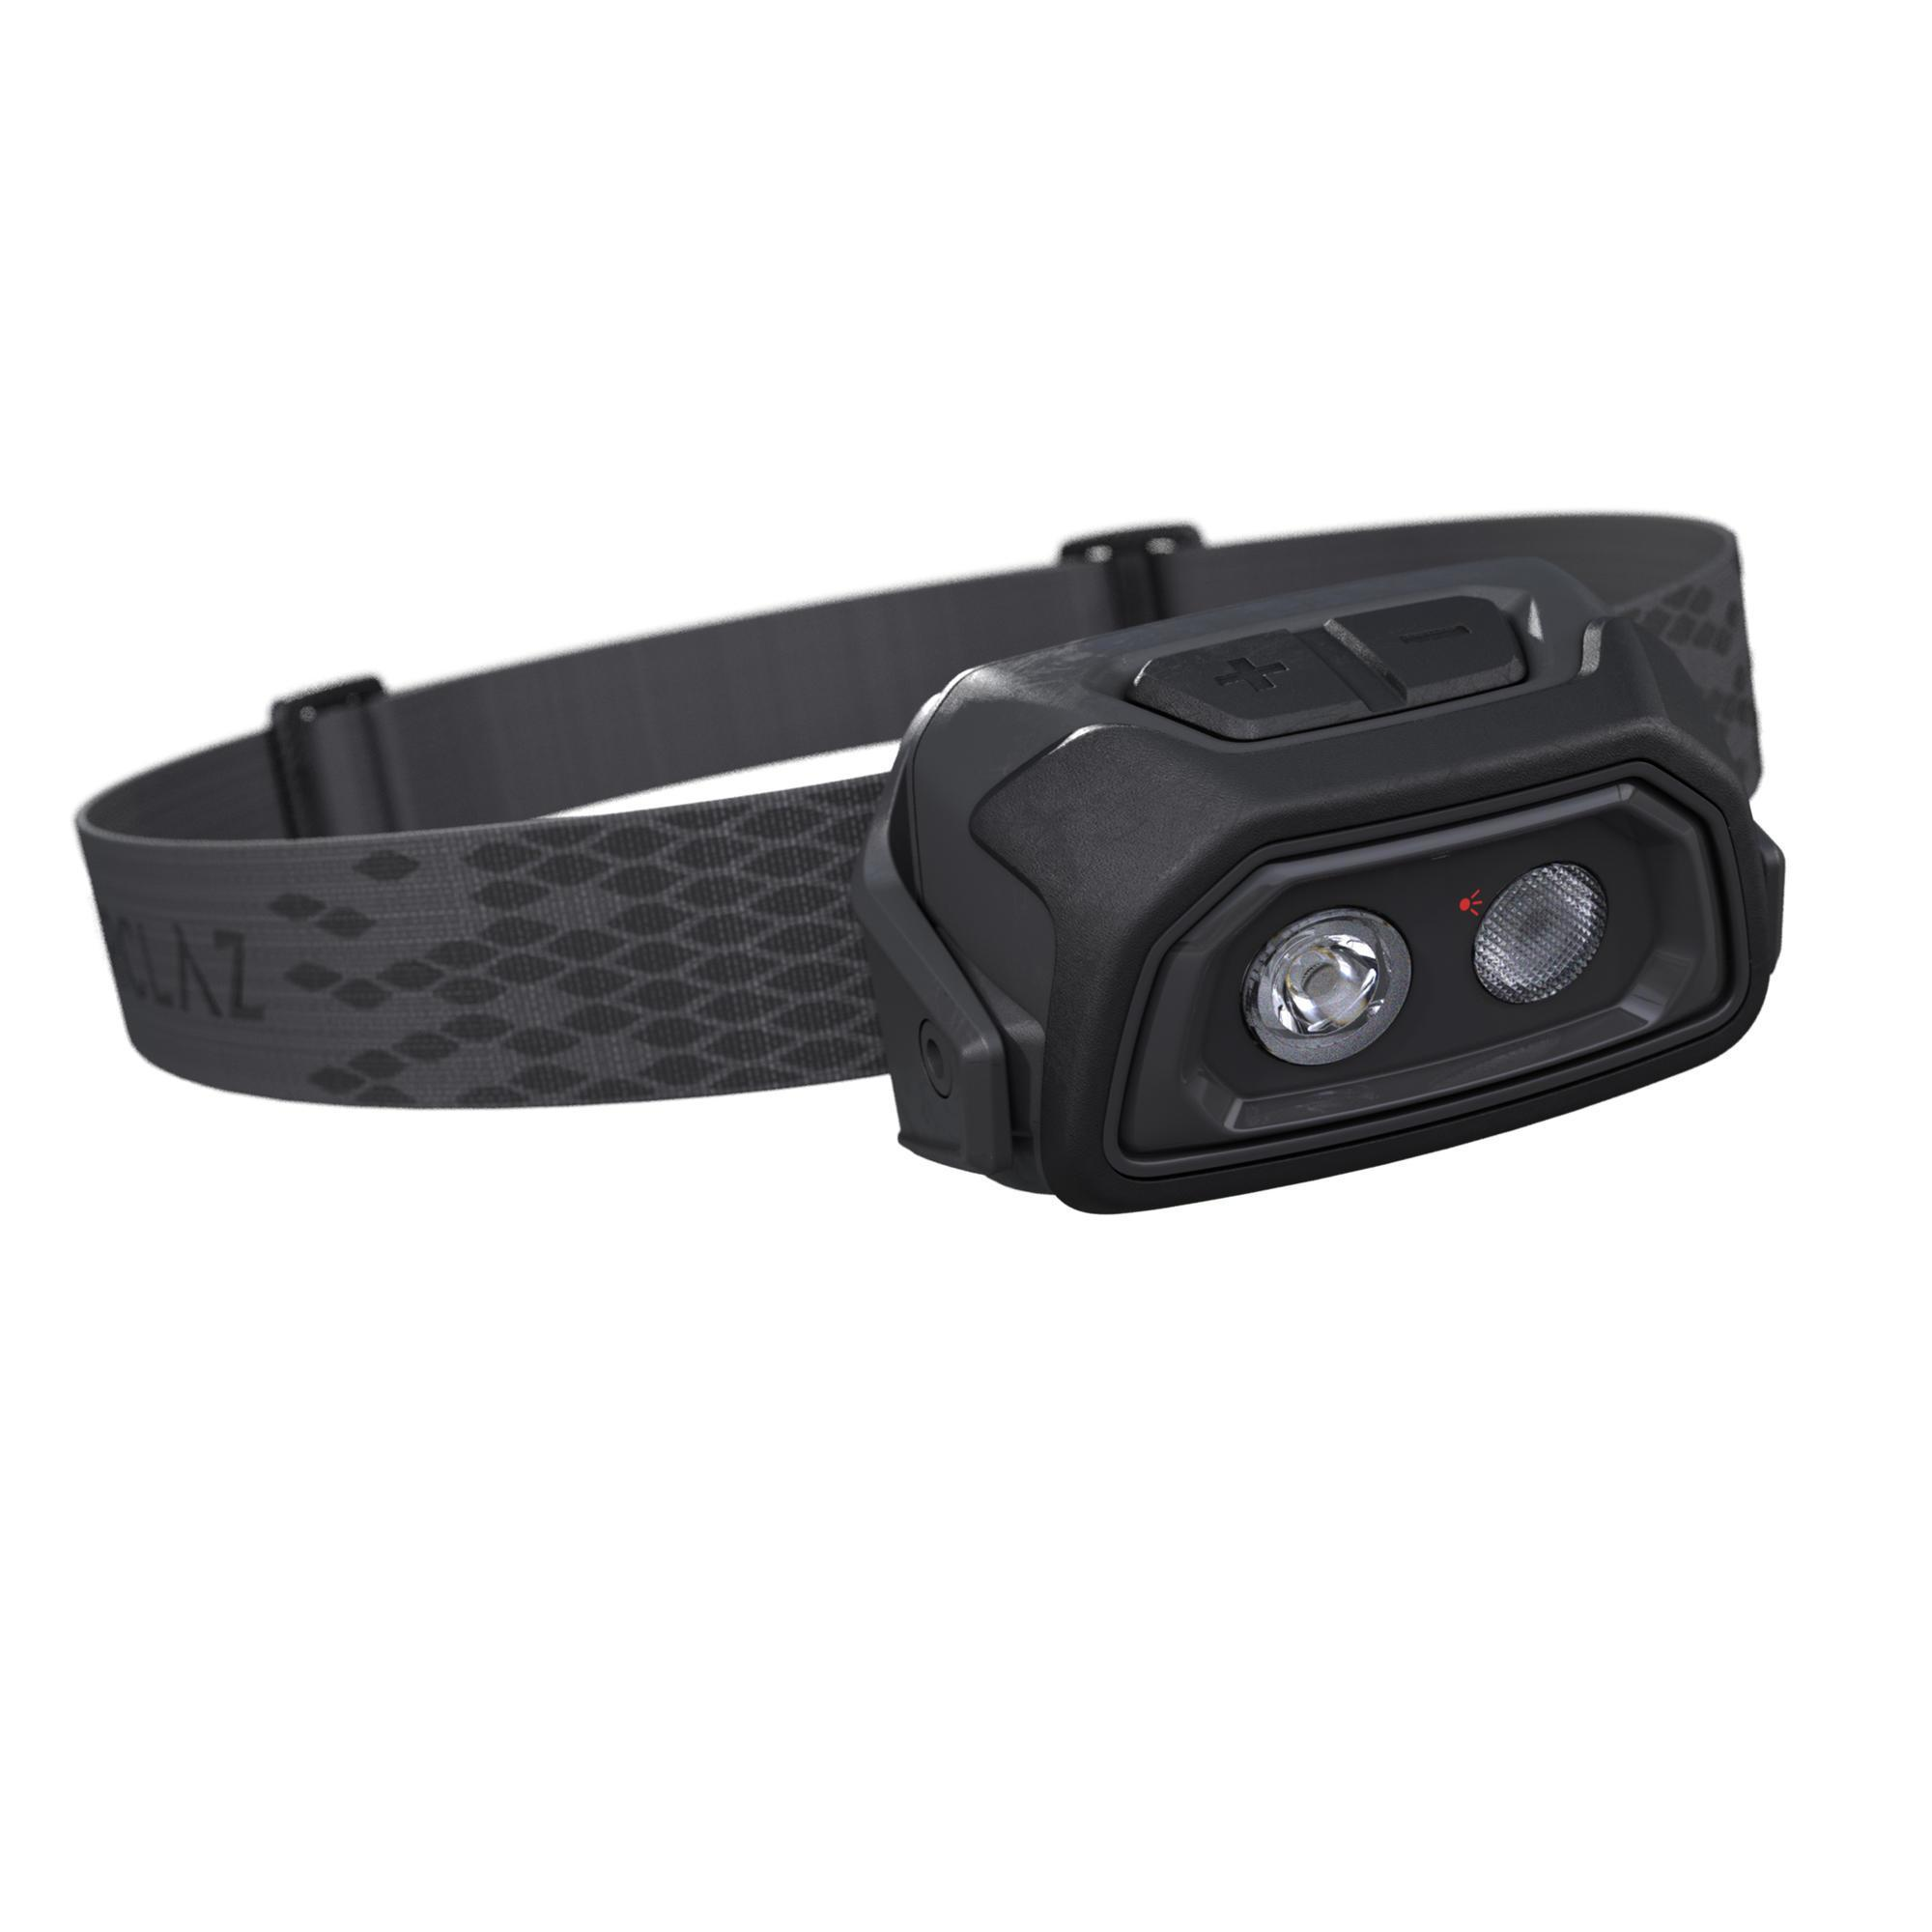 Forclaz USB-herlaadbare hoofdlamp Trek 500 200 lumen